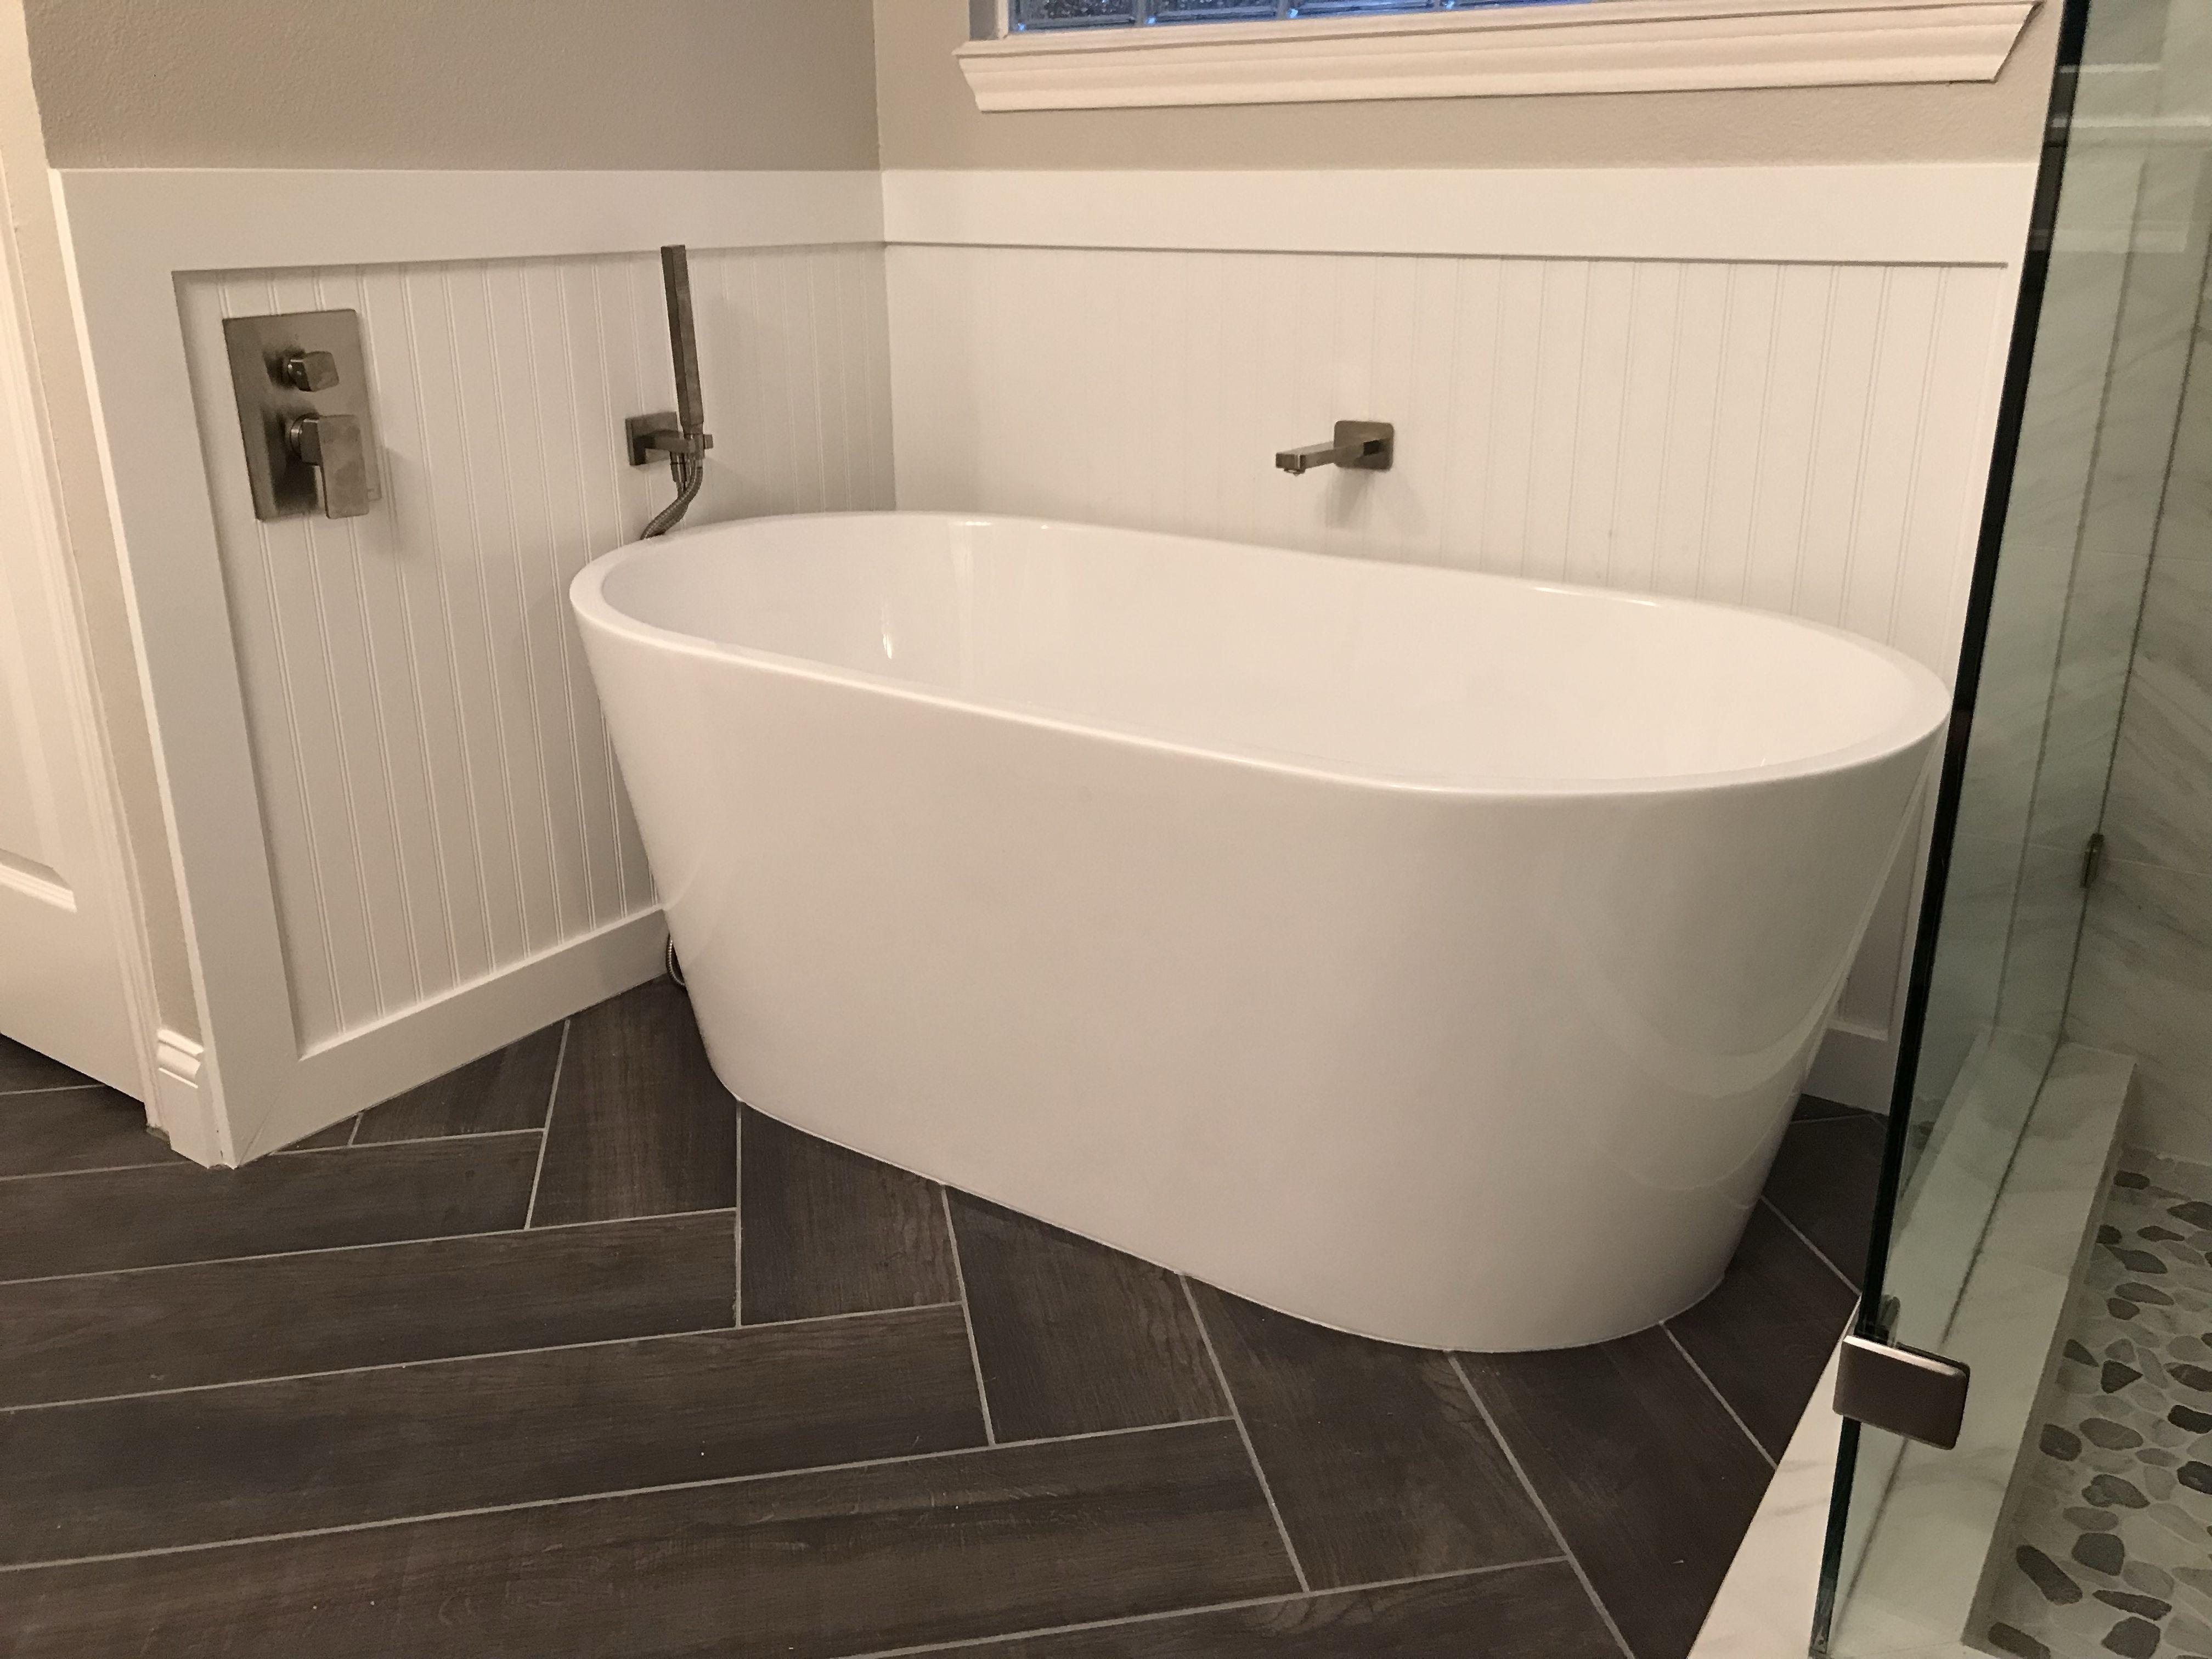 59 Free Standing Tub Free Standing Tub Freestanding Tub Faucet